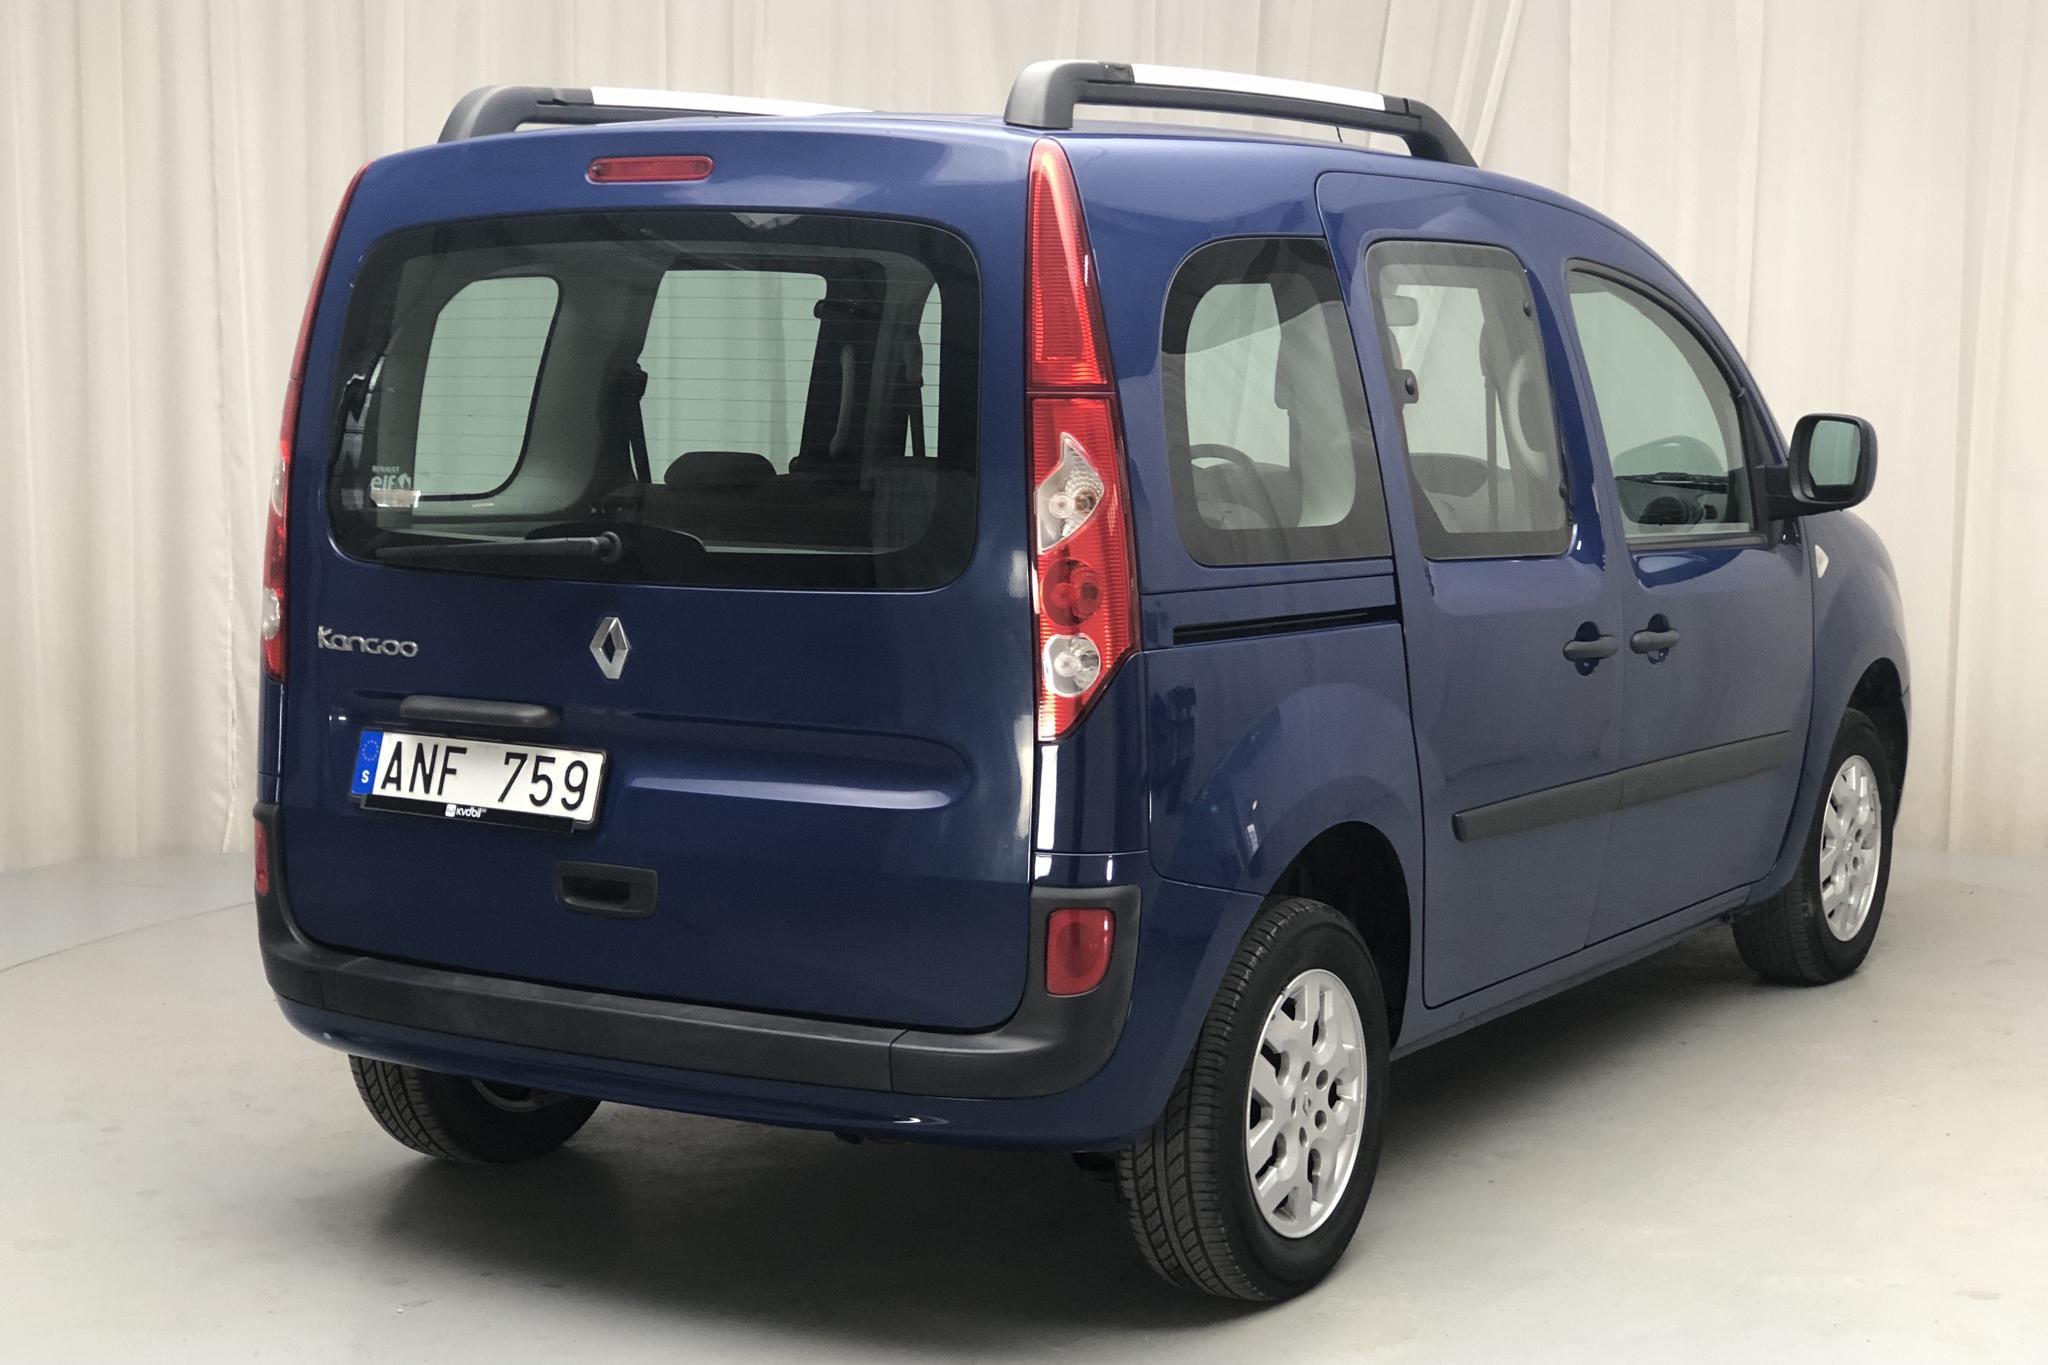 Renault Kangoo II 1.6 E85 (105hk) - 112 310 km - Manual - Dark Blue - 2010